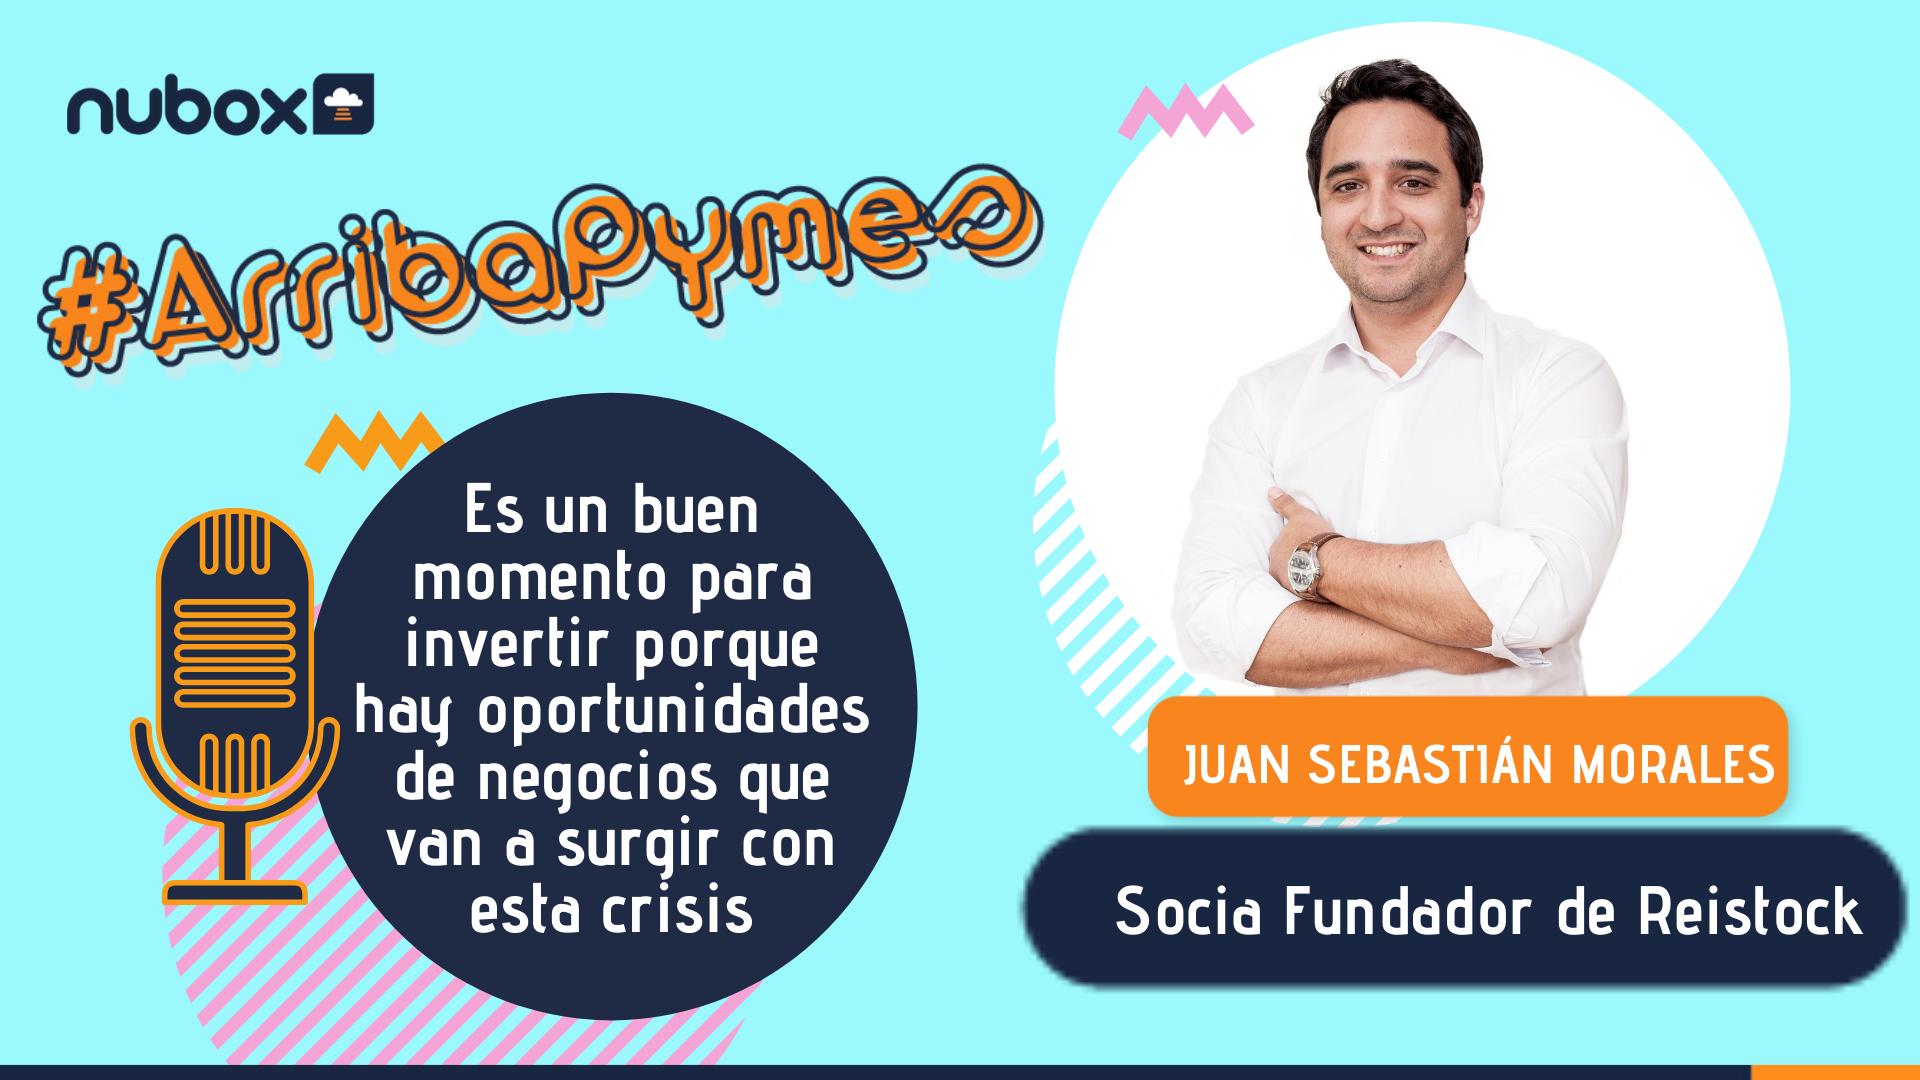 [Podcast #5] Juan Sebastián Morales: Es buen momento para invertir porque la crisis generó oportunidades